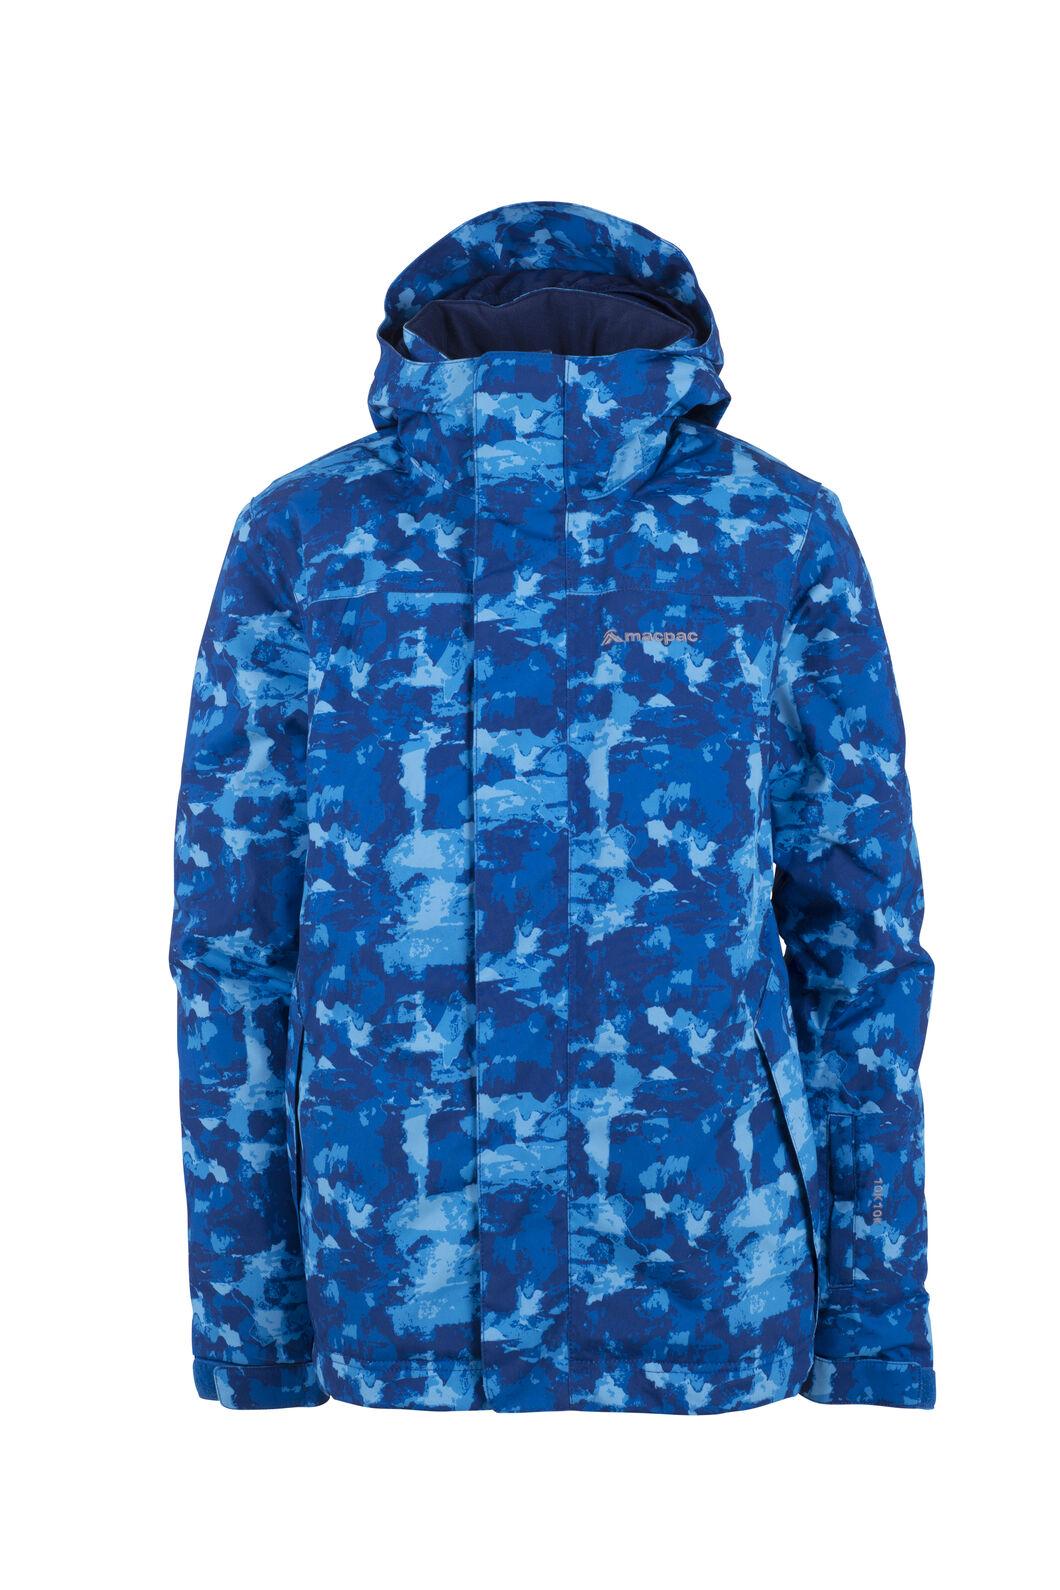 Macpac Spree Ski Jacket - Kids', Blue Print, hi-res